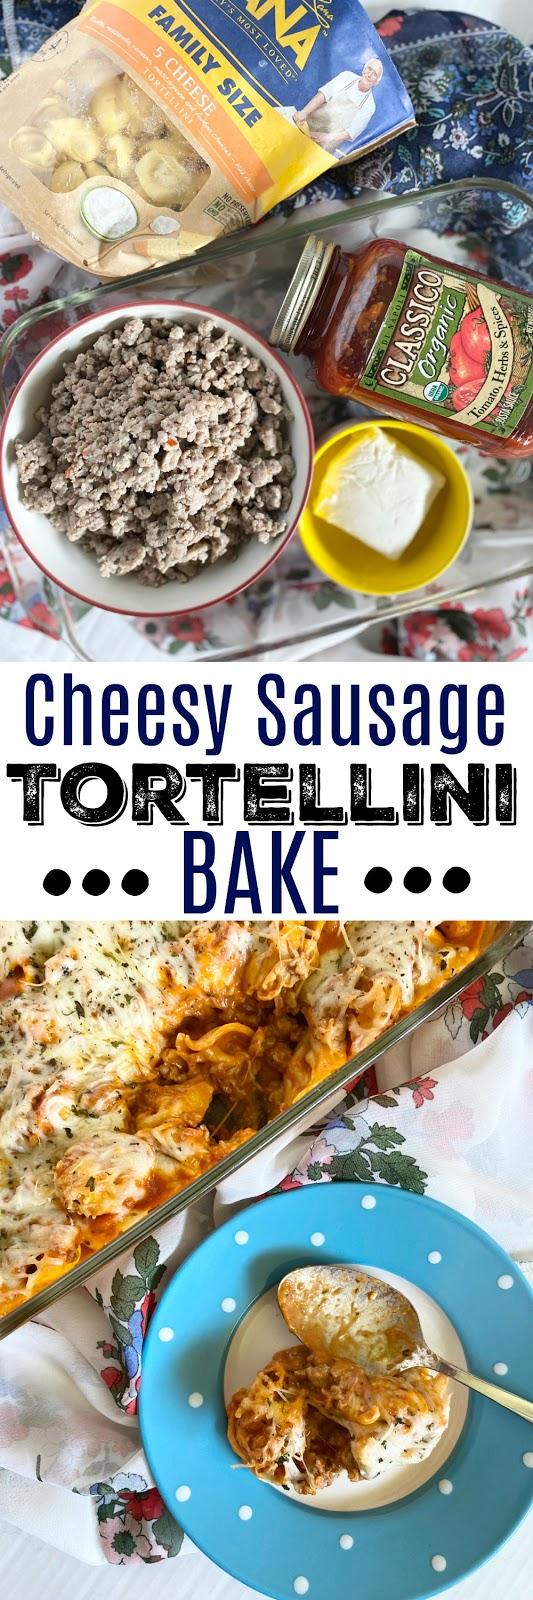 cheesy sausage tortellini bake #sweetsavoryeats